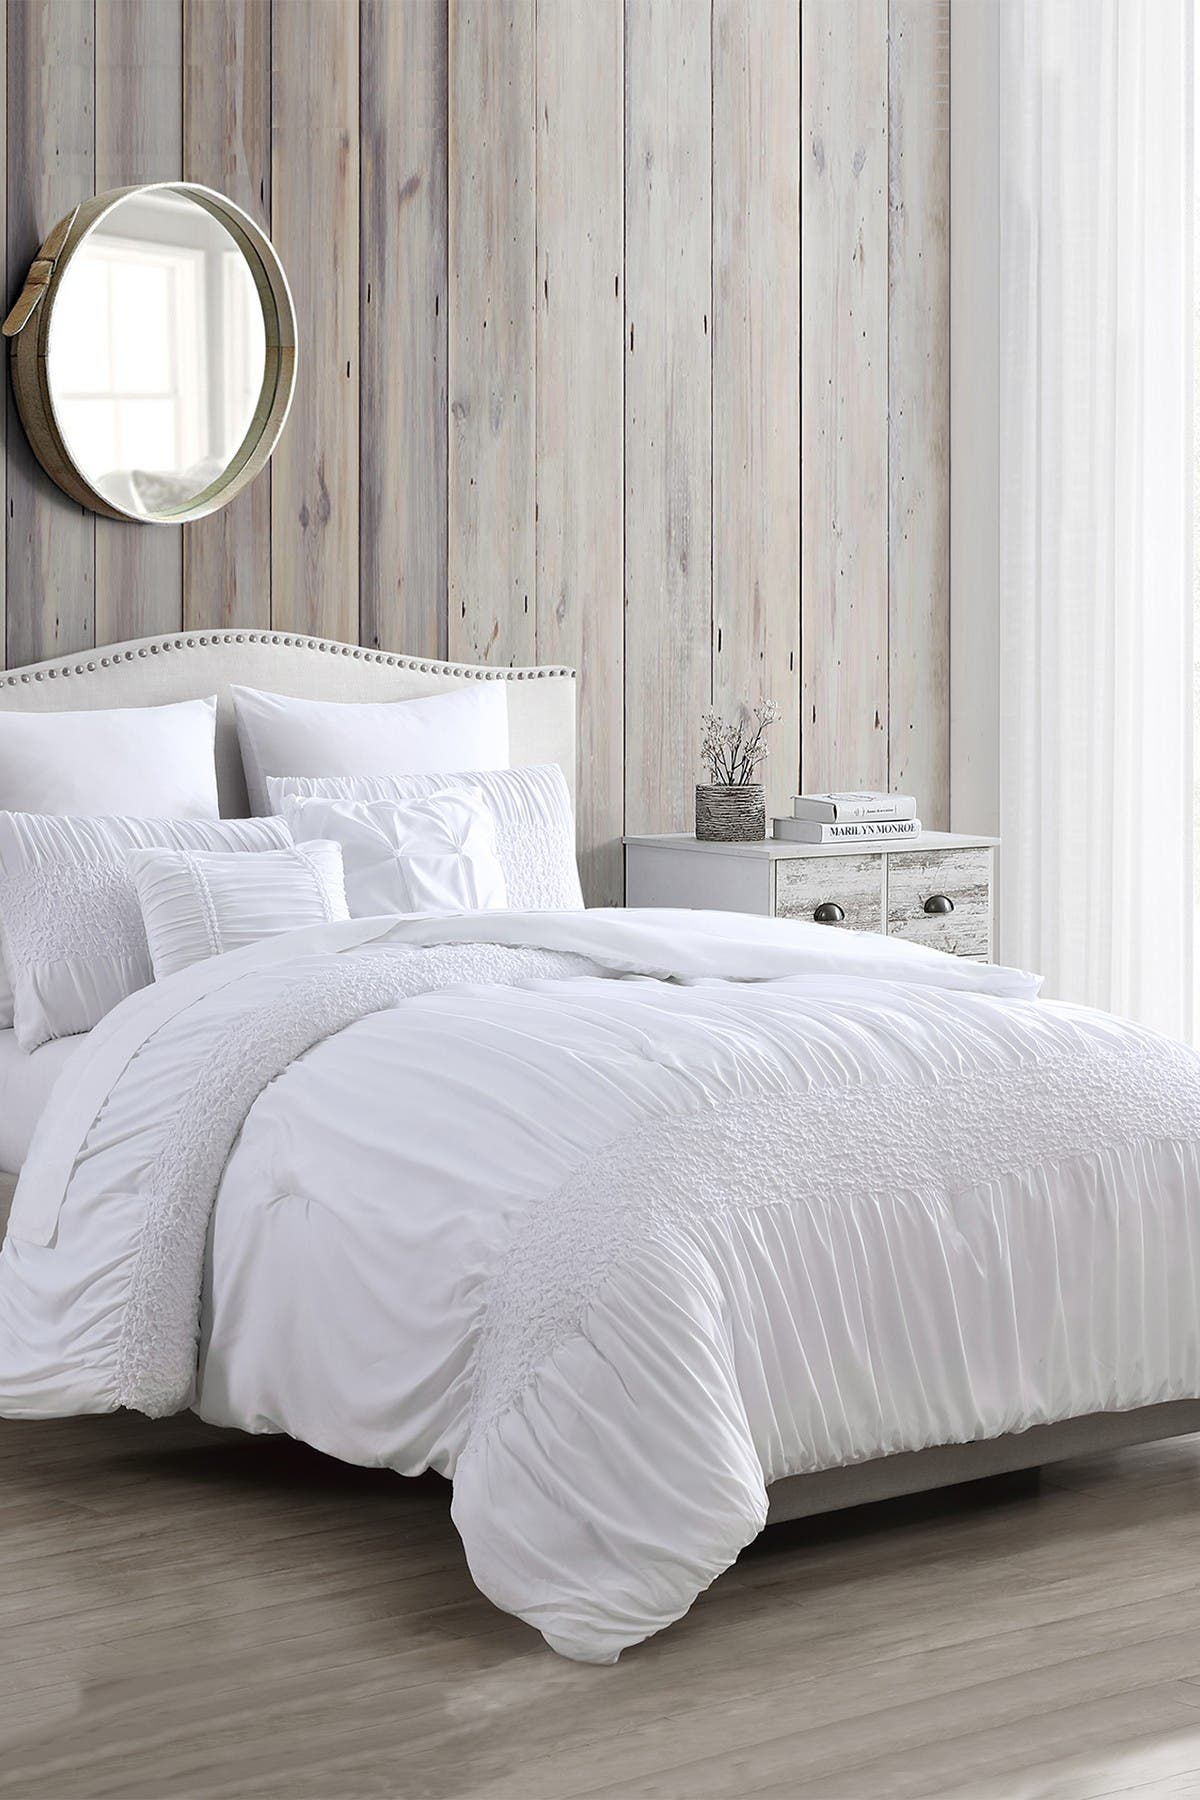 Image of Modern Threads 7-Piece Solid Textured Comforter Set - Ashley - Queen